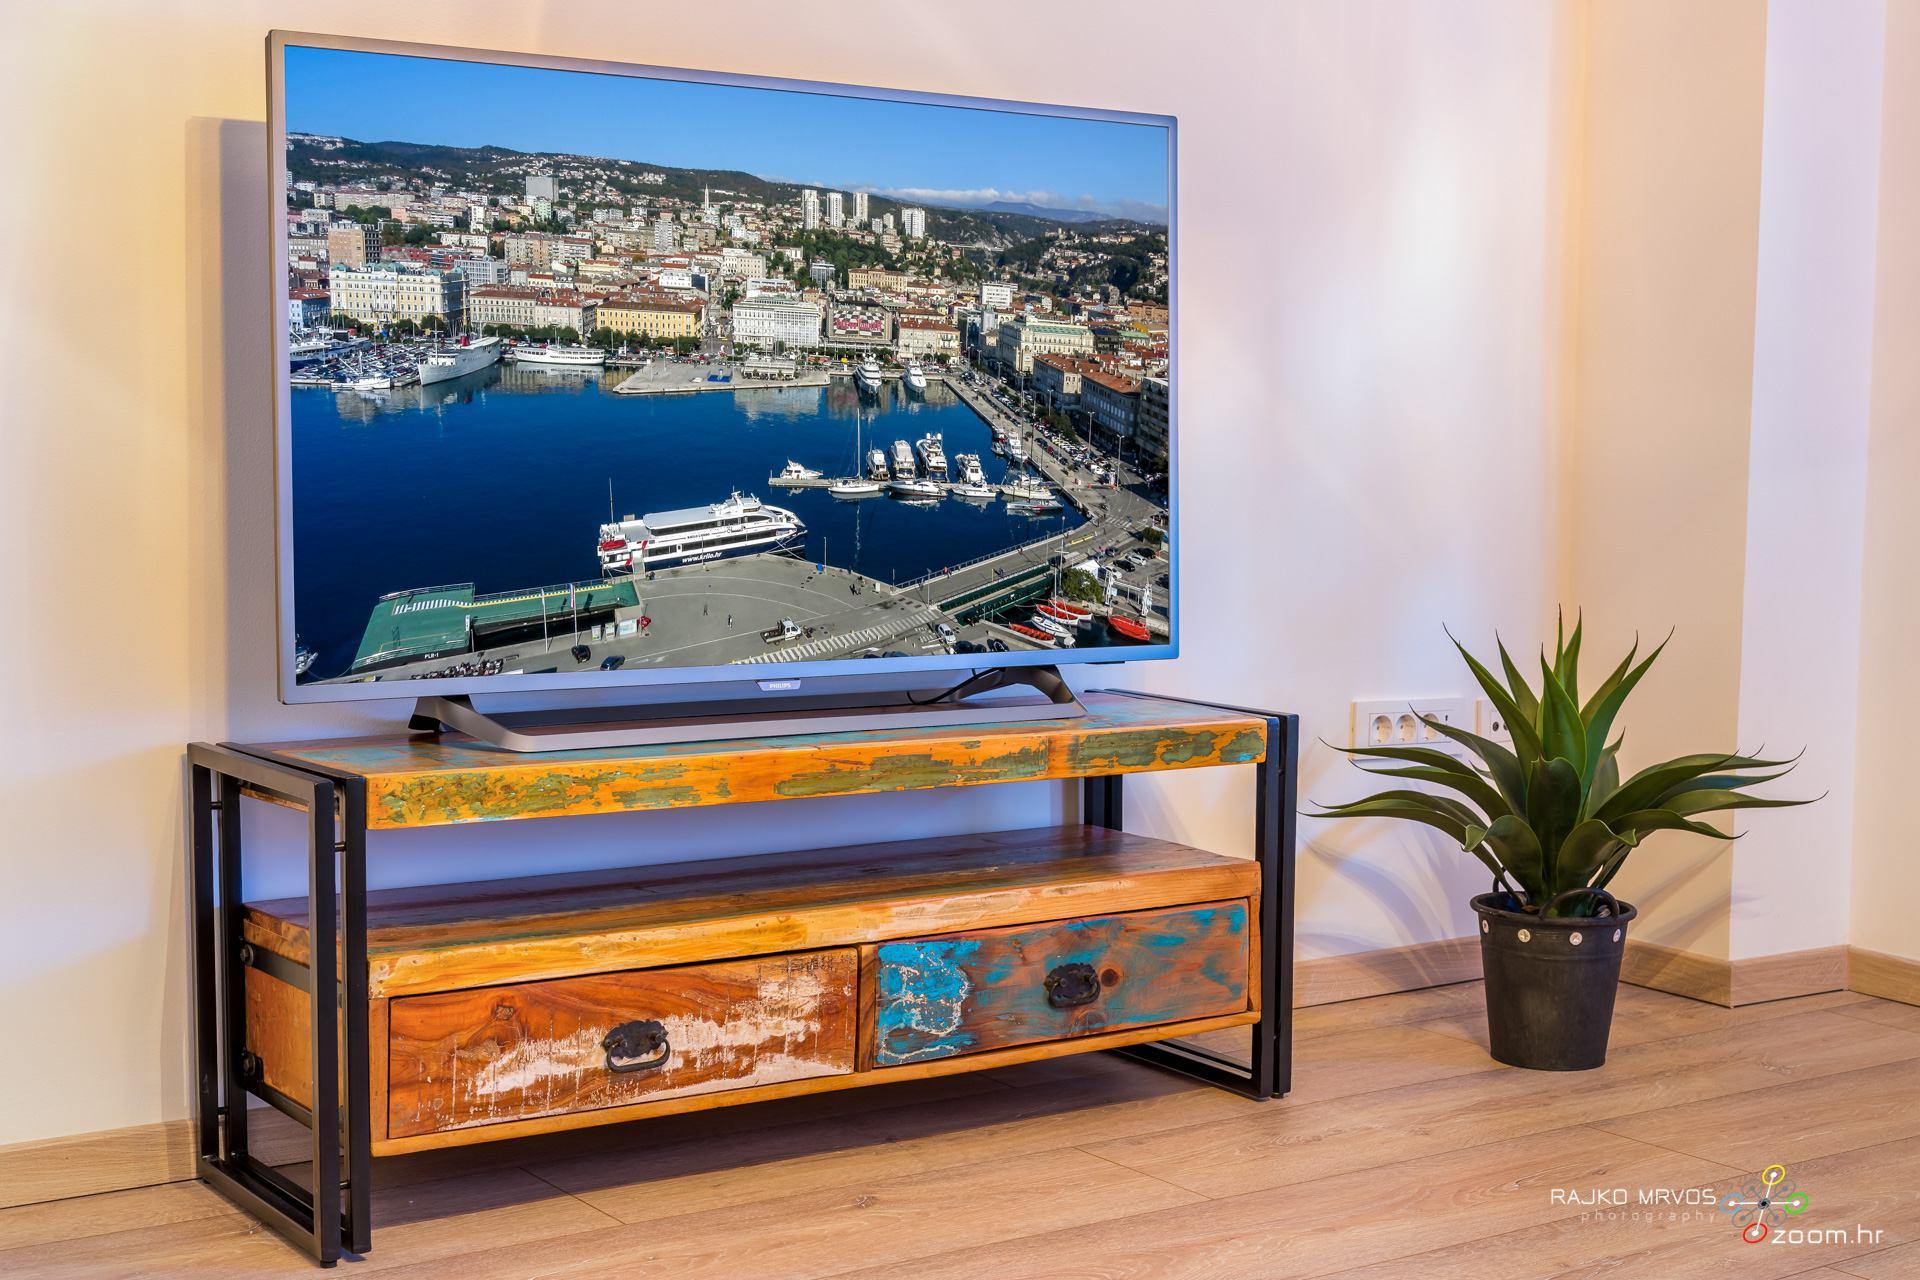 fotografiranje-interijera-fotograf-apartmana-vila-kuca-hotela-apartman-Gabby-Rijeka-23